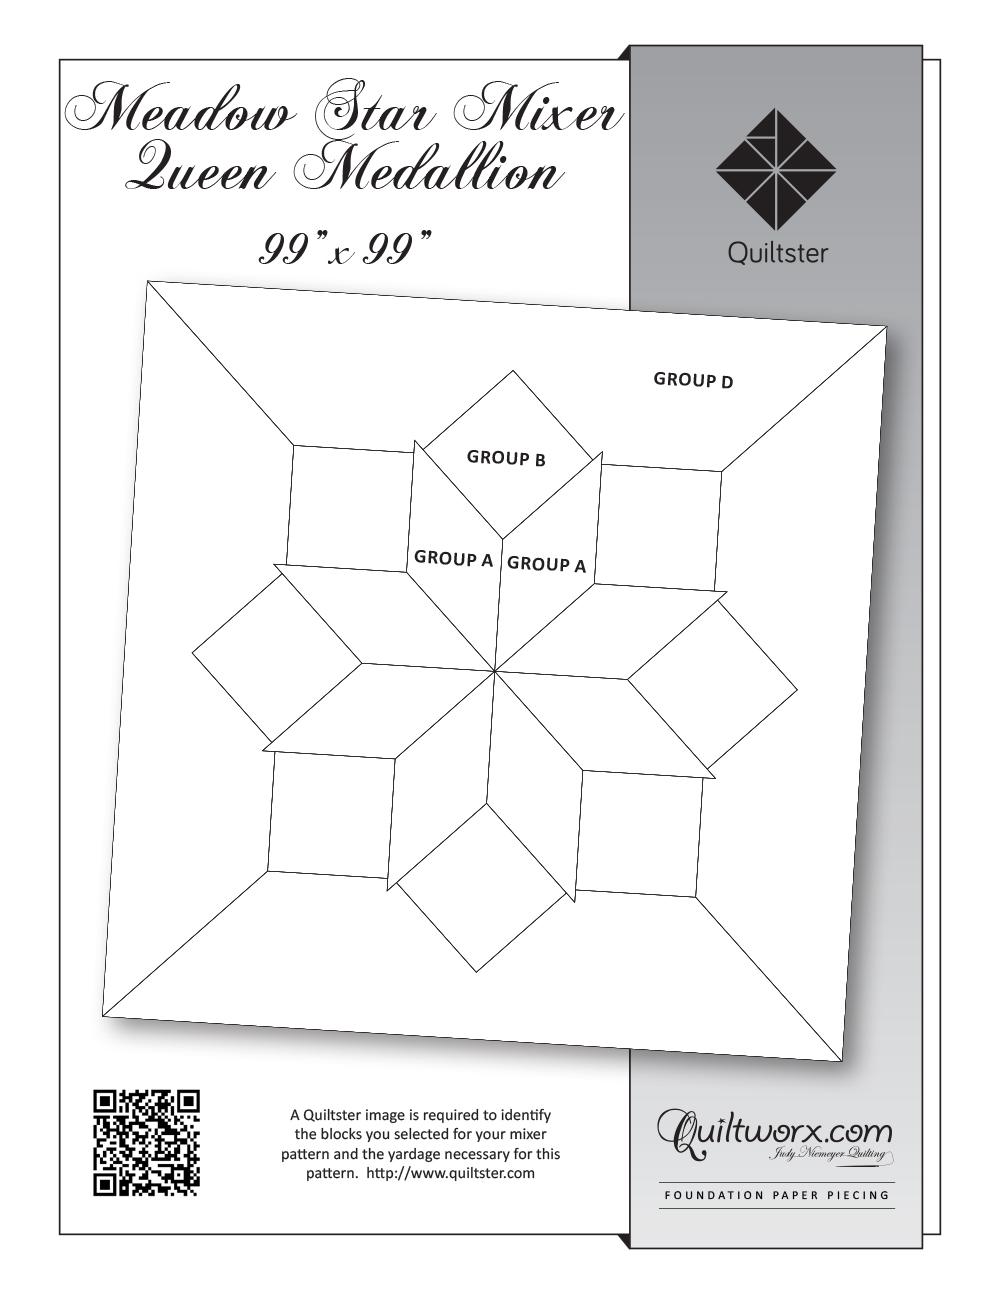 Meadow Star Mixer Queen Medallion